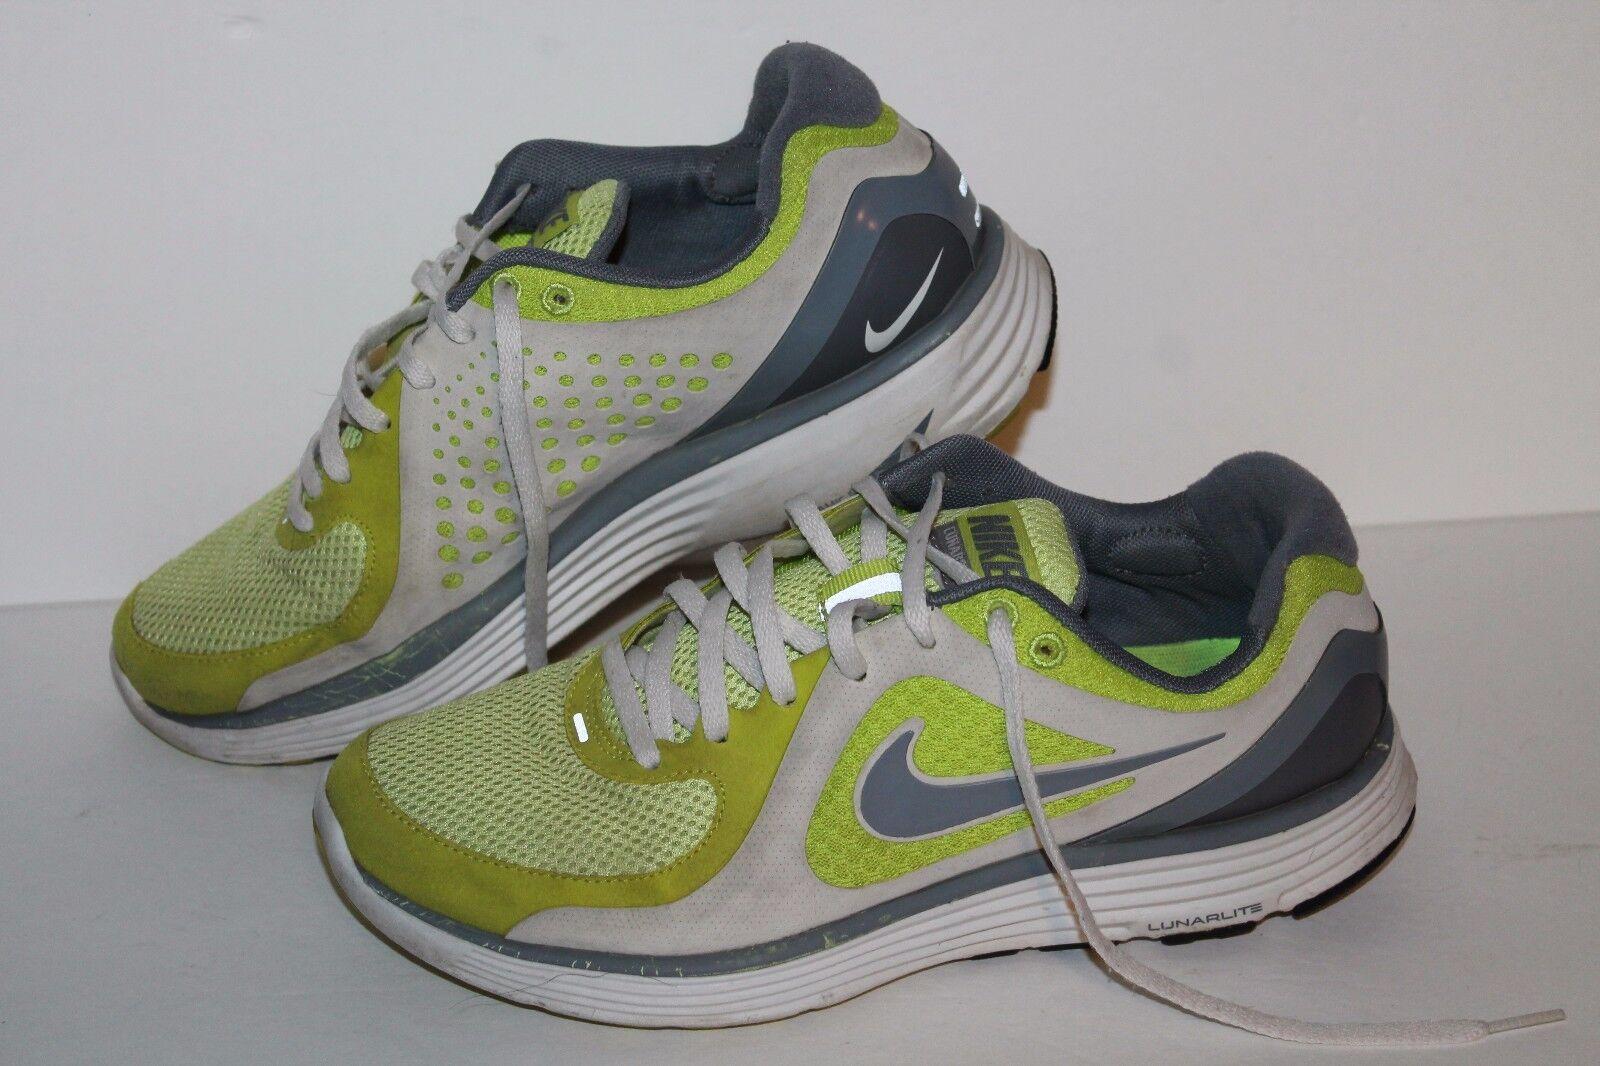 Nike Lunarswift + Running Shoes, 8 Lime/Grey, Womens US Size 8 Shoes, 0cf4e7